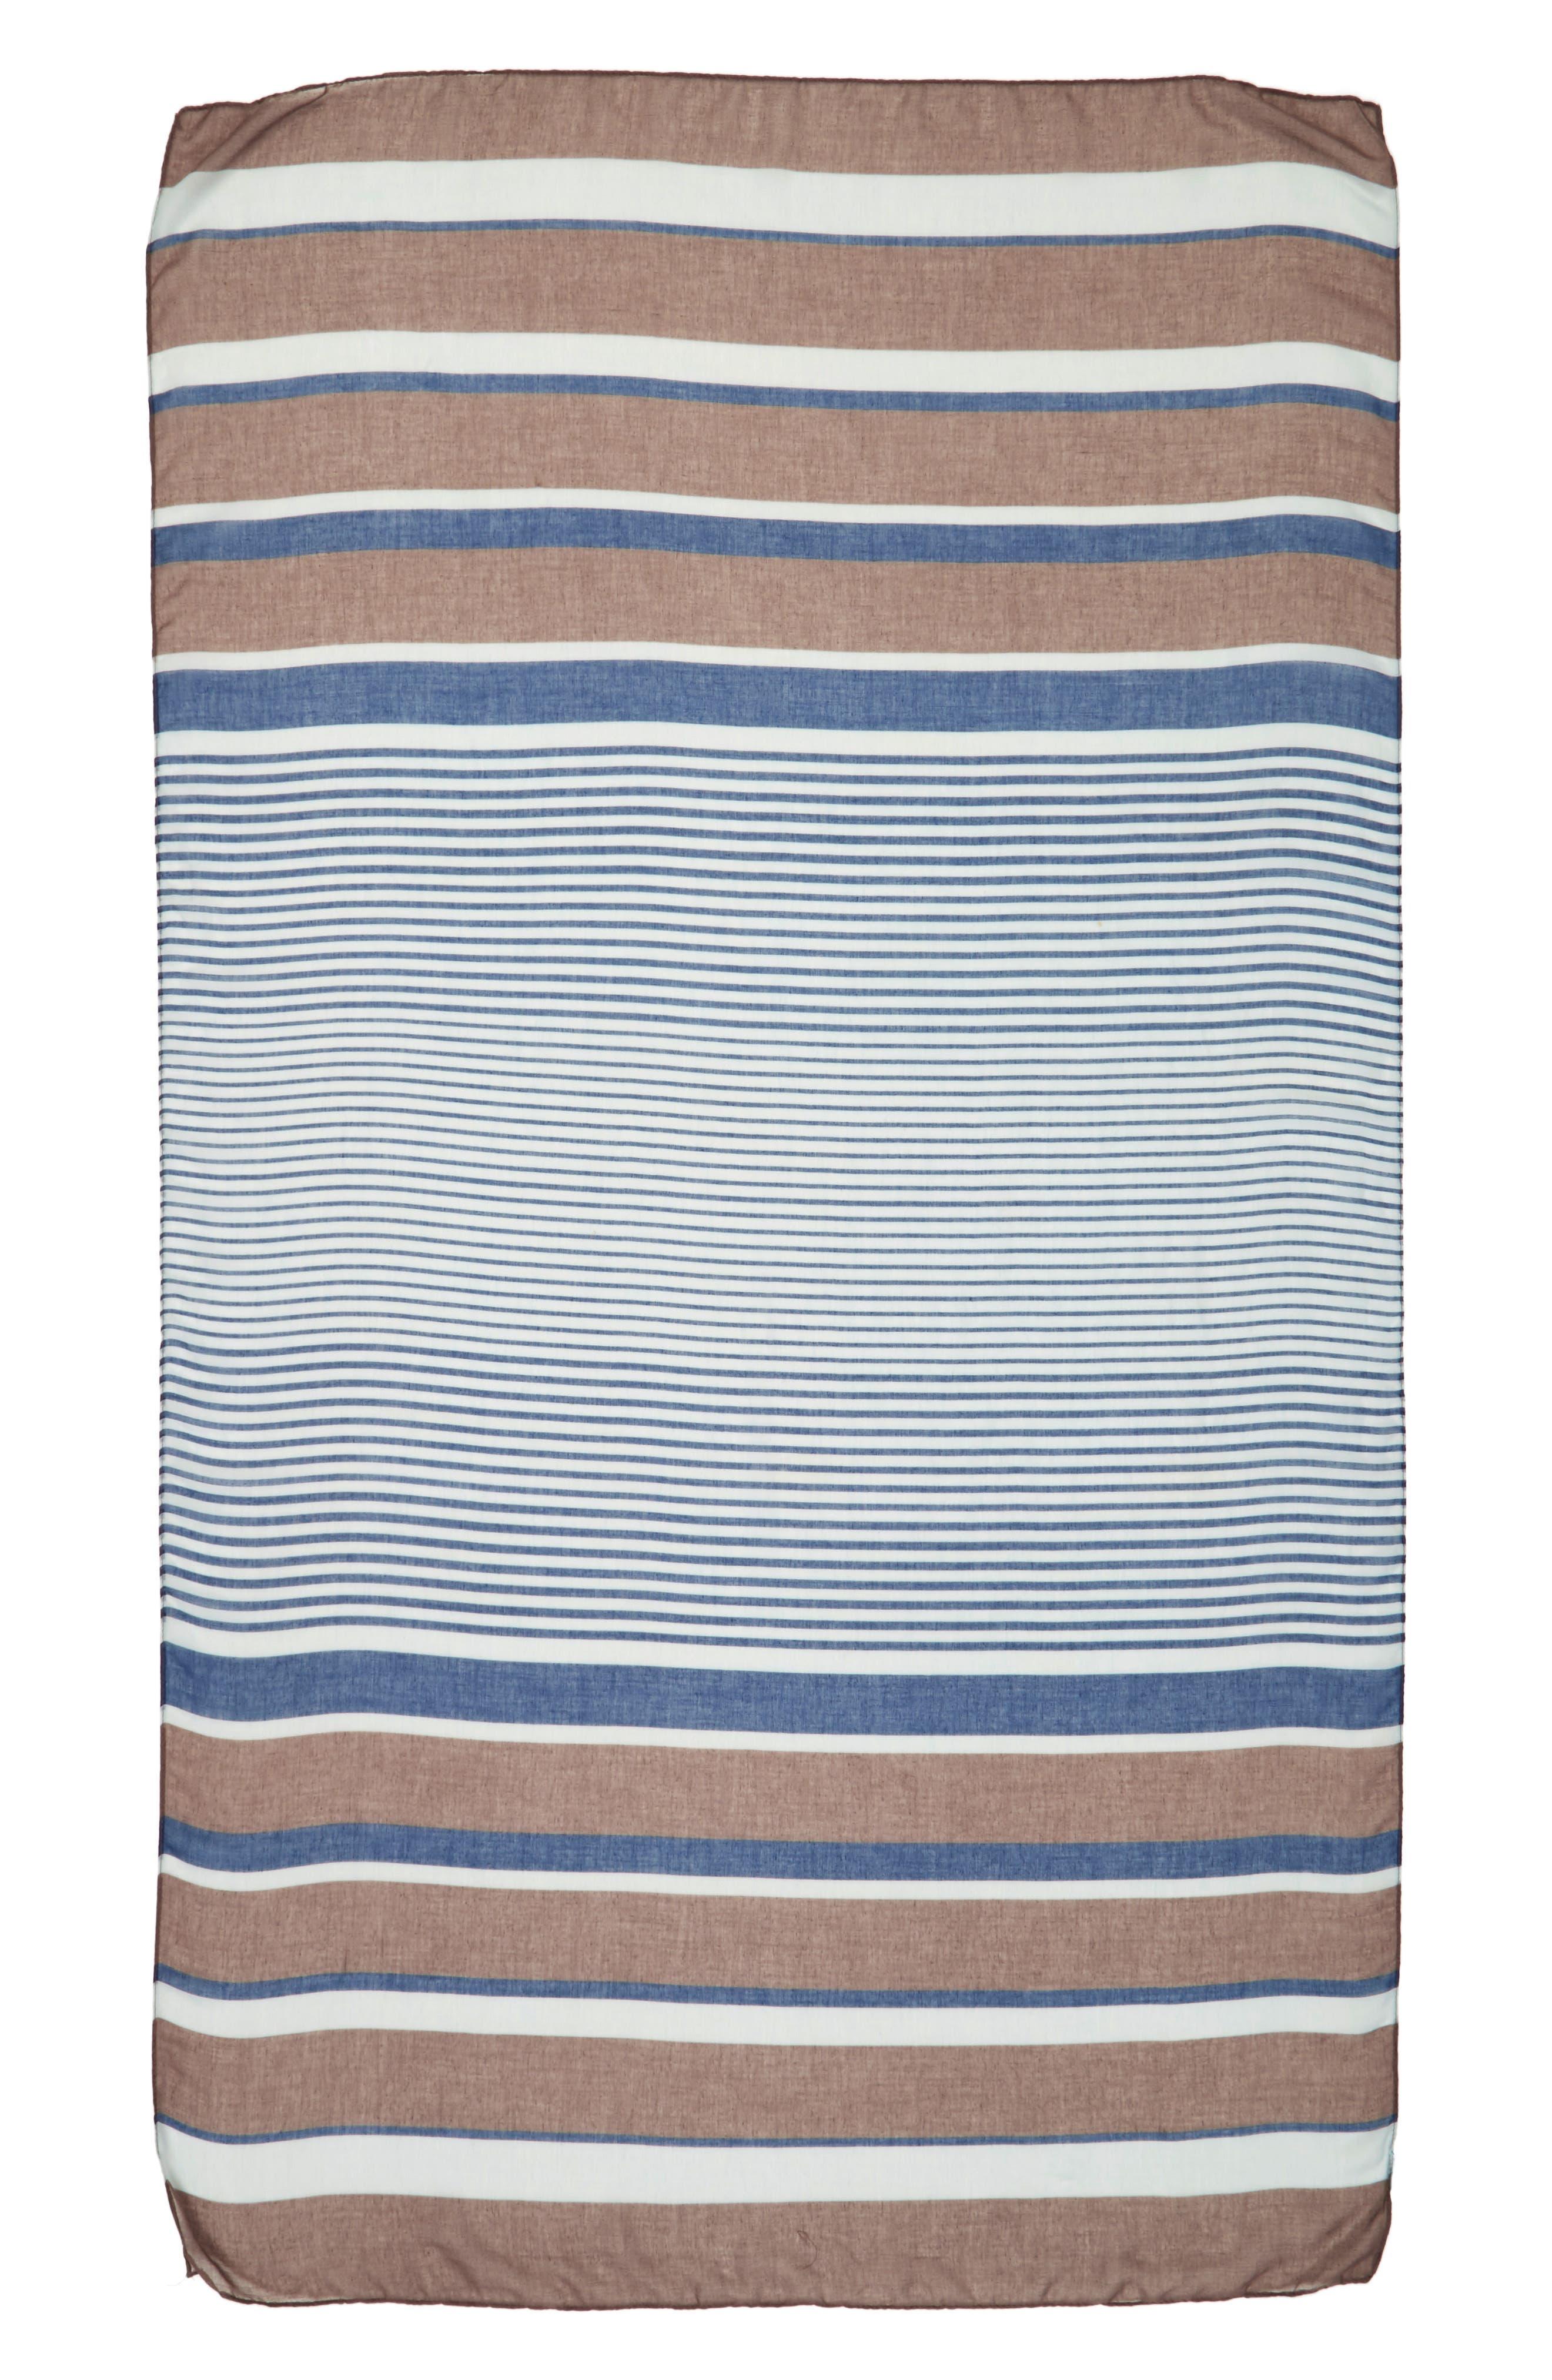 Alternate Image 2  - Accessory Collective Multi Stripe Oblong Scarf